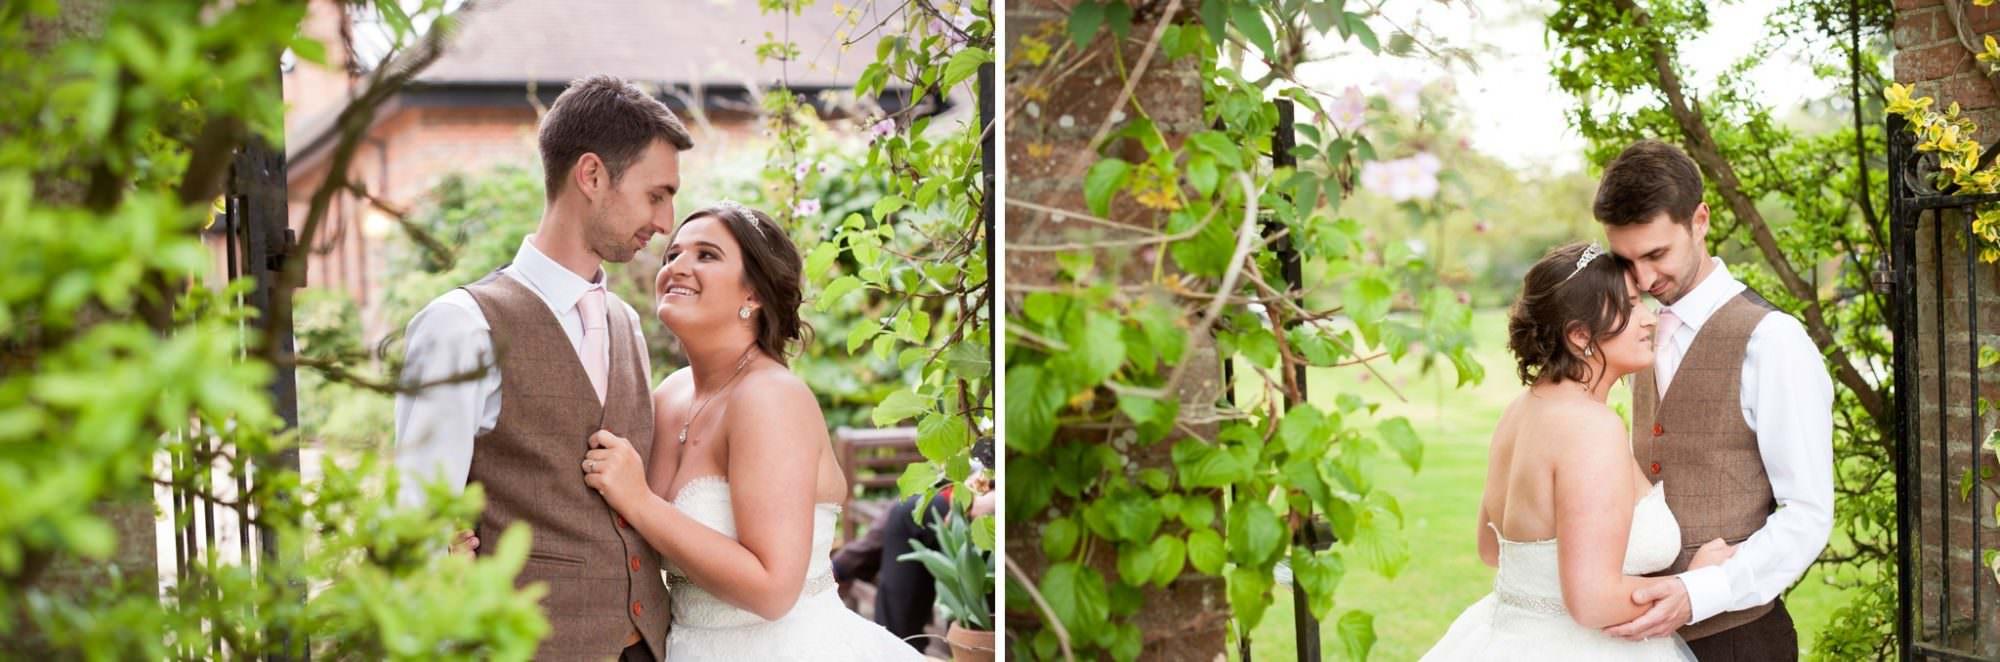 Brockenhurst Wedding Photographer